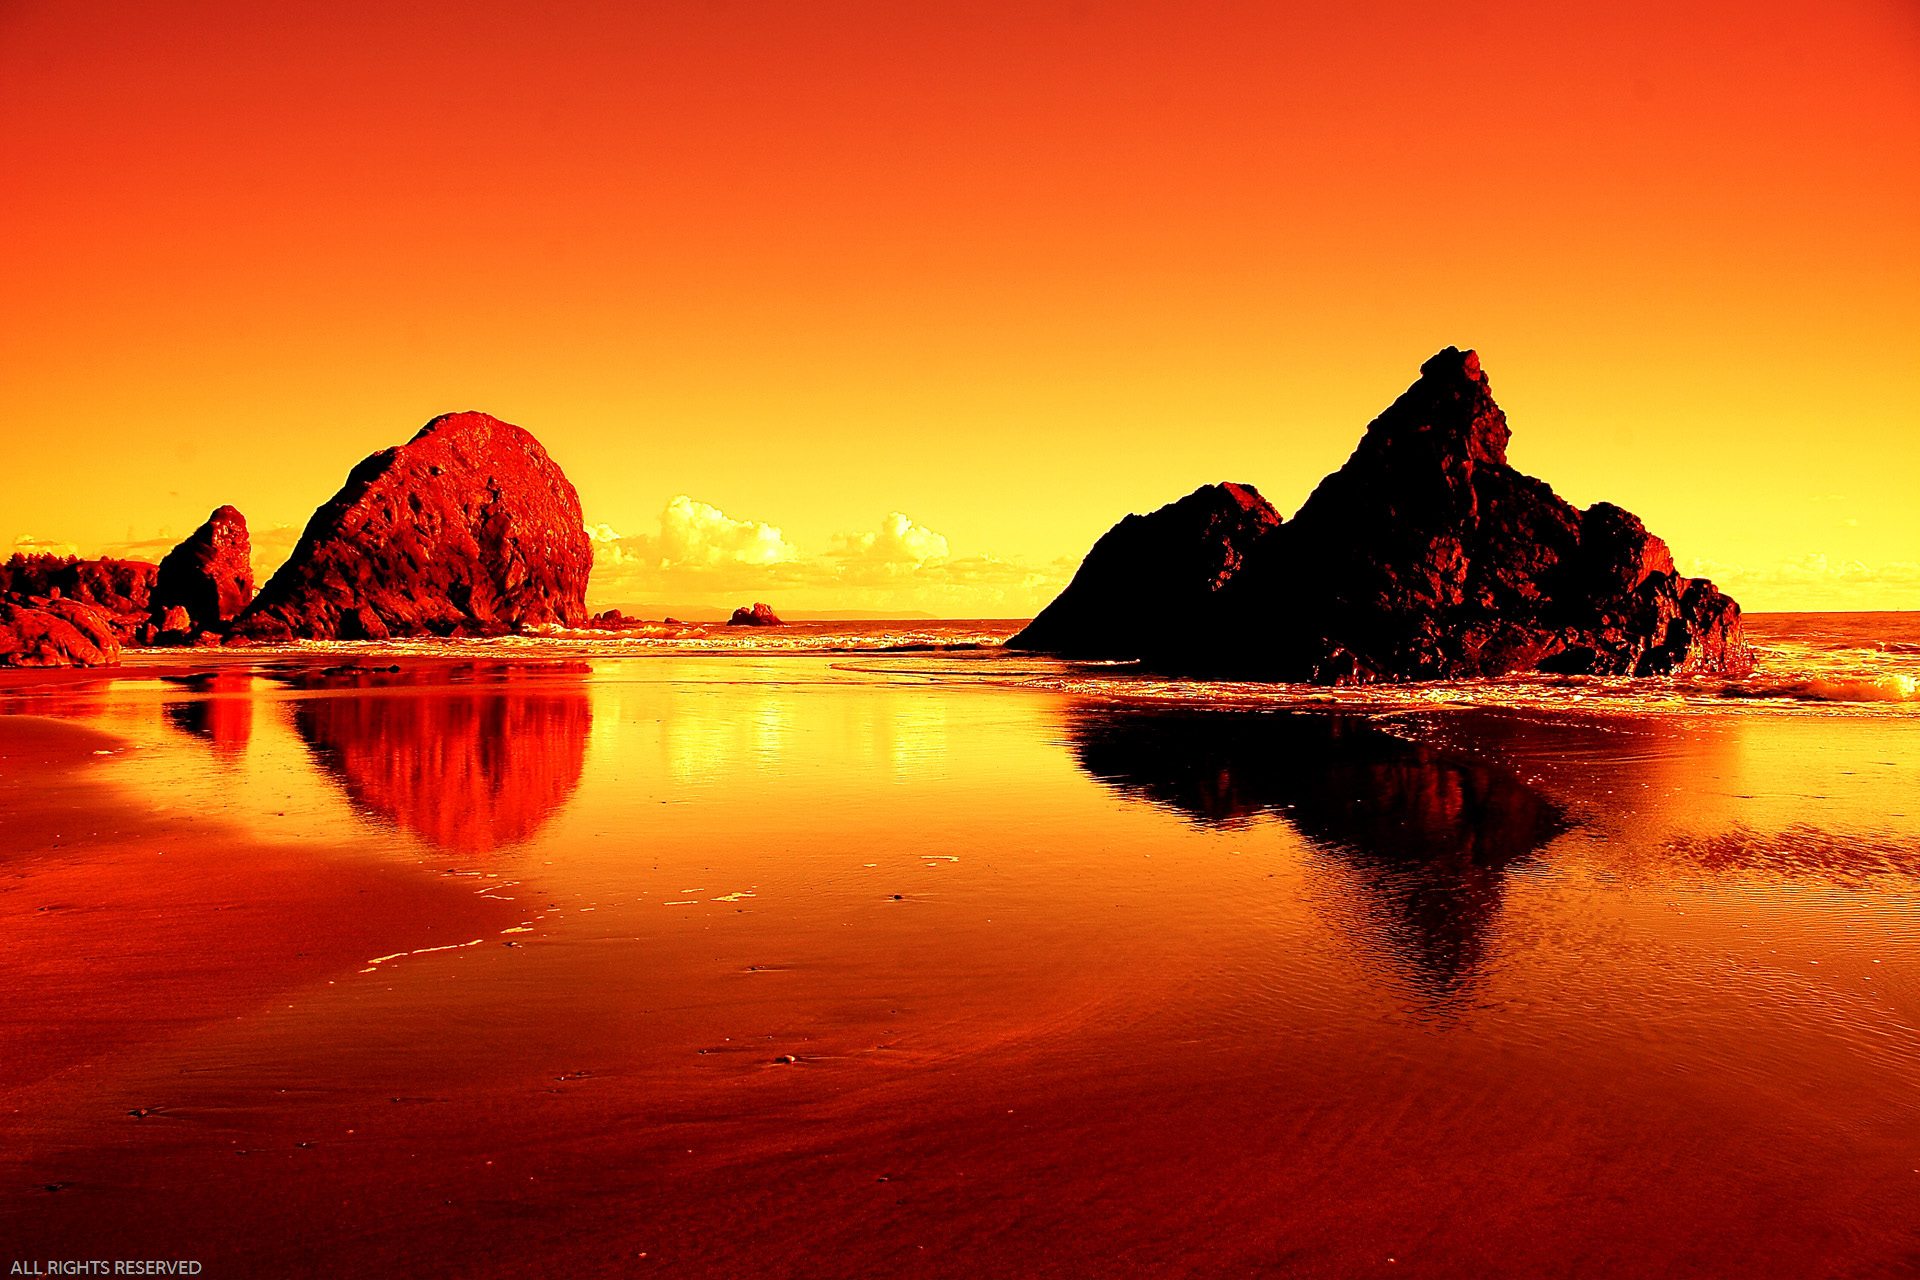 Sfondi desktop paesaggi hd tramonto rosso sfondi hd gratis for Sfondi desktop hd paesaggi